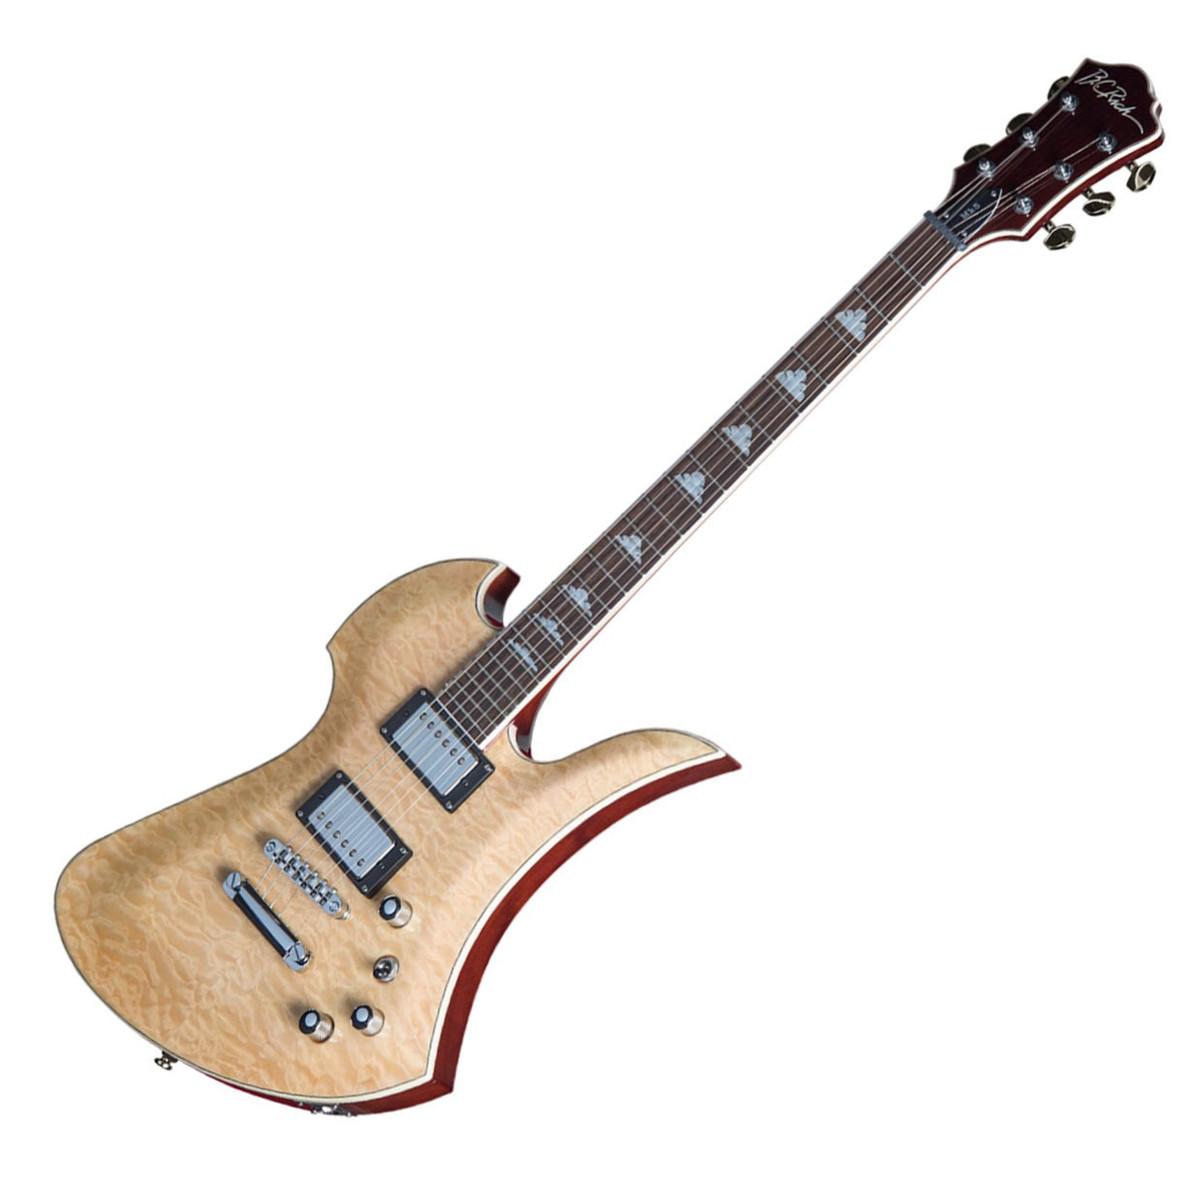 preview bc rich mockingbird mk5 electric guitar, natural at gear4music com bc rich eagle wiring diagram at gsmportal.co